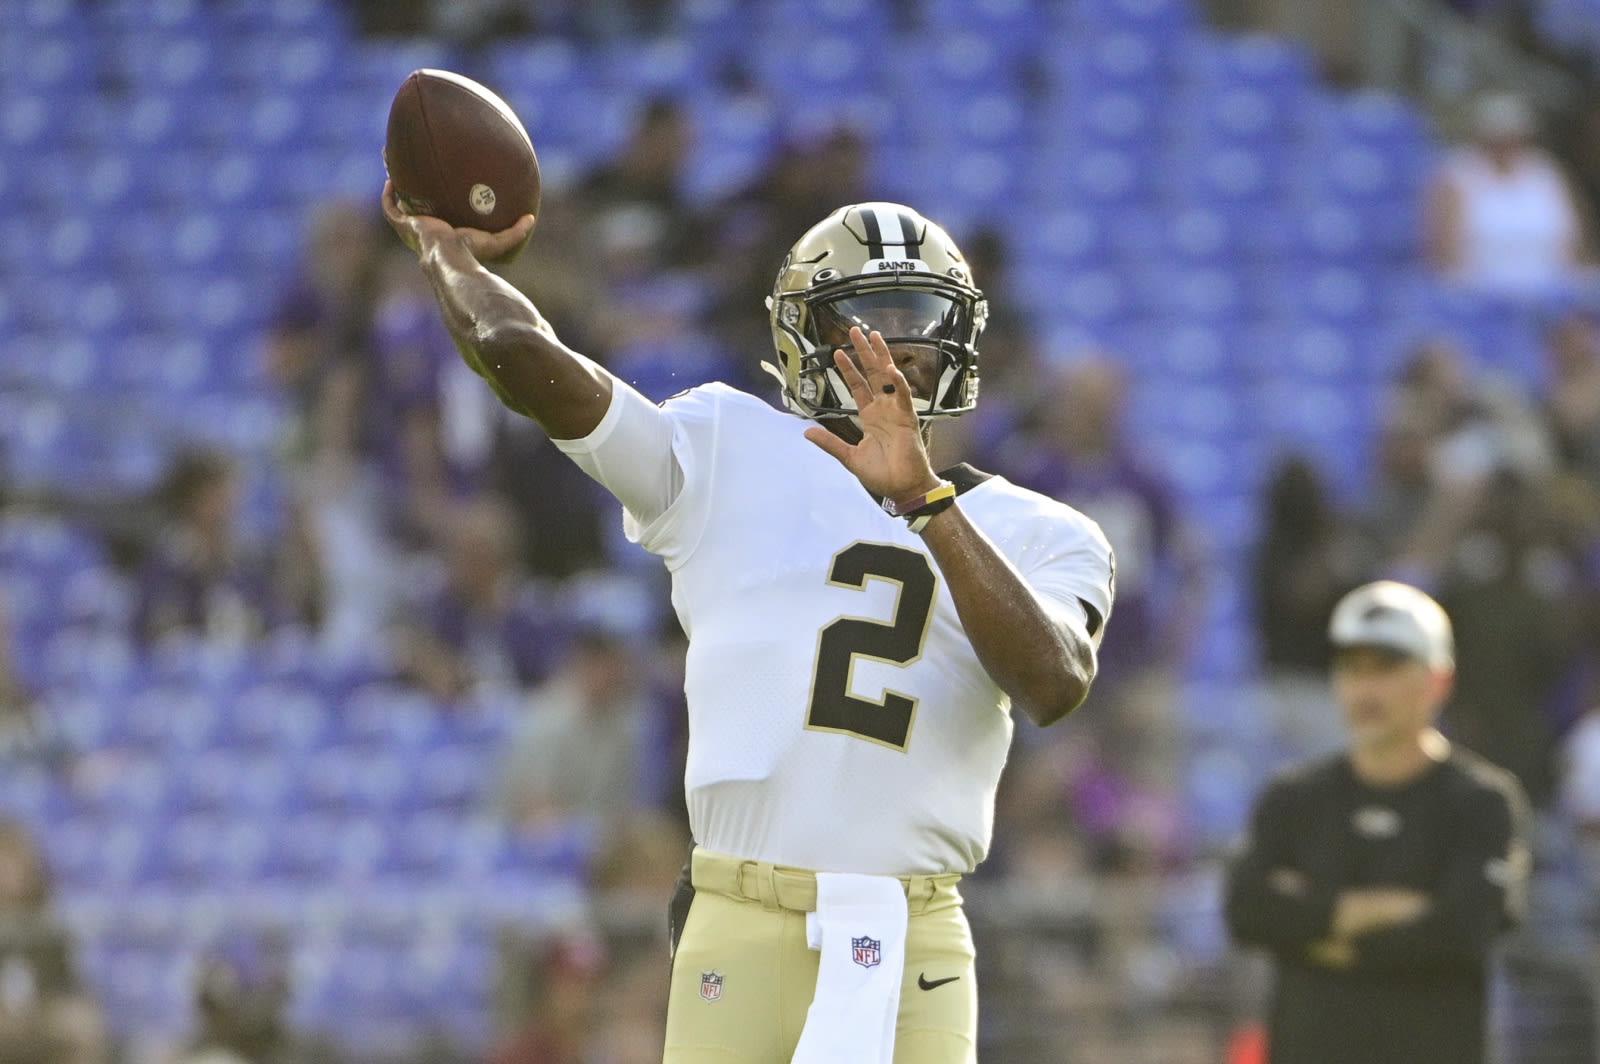 New Orleans Saints: Jameis Winston should make Pro Bowl, as an alternate